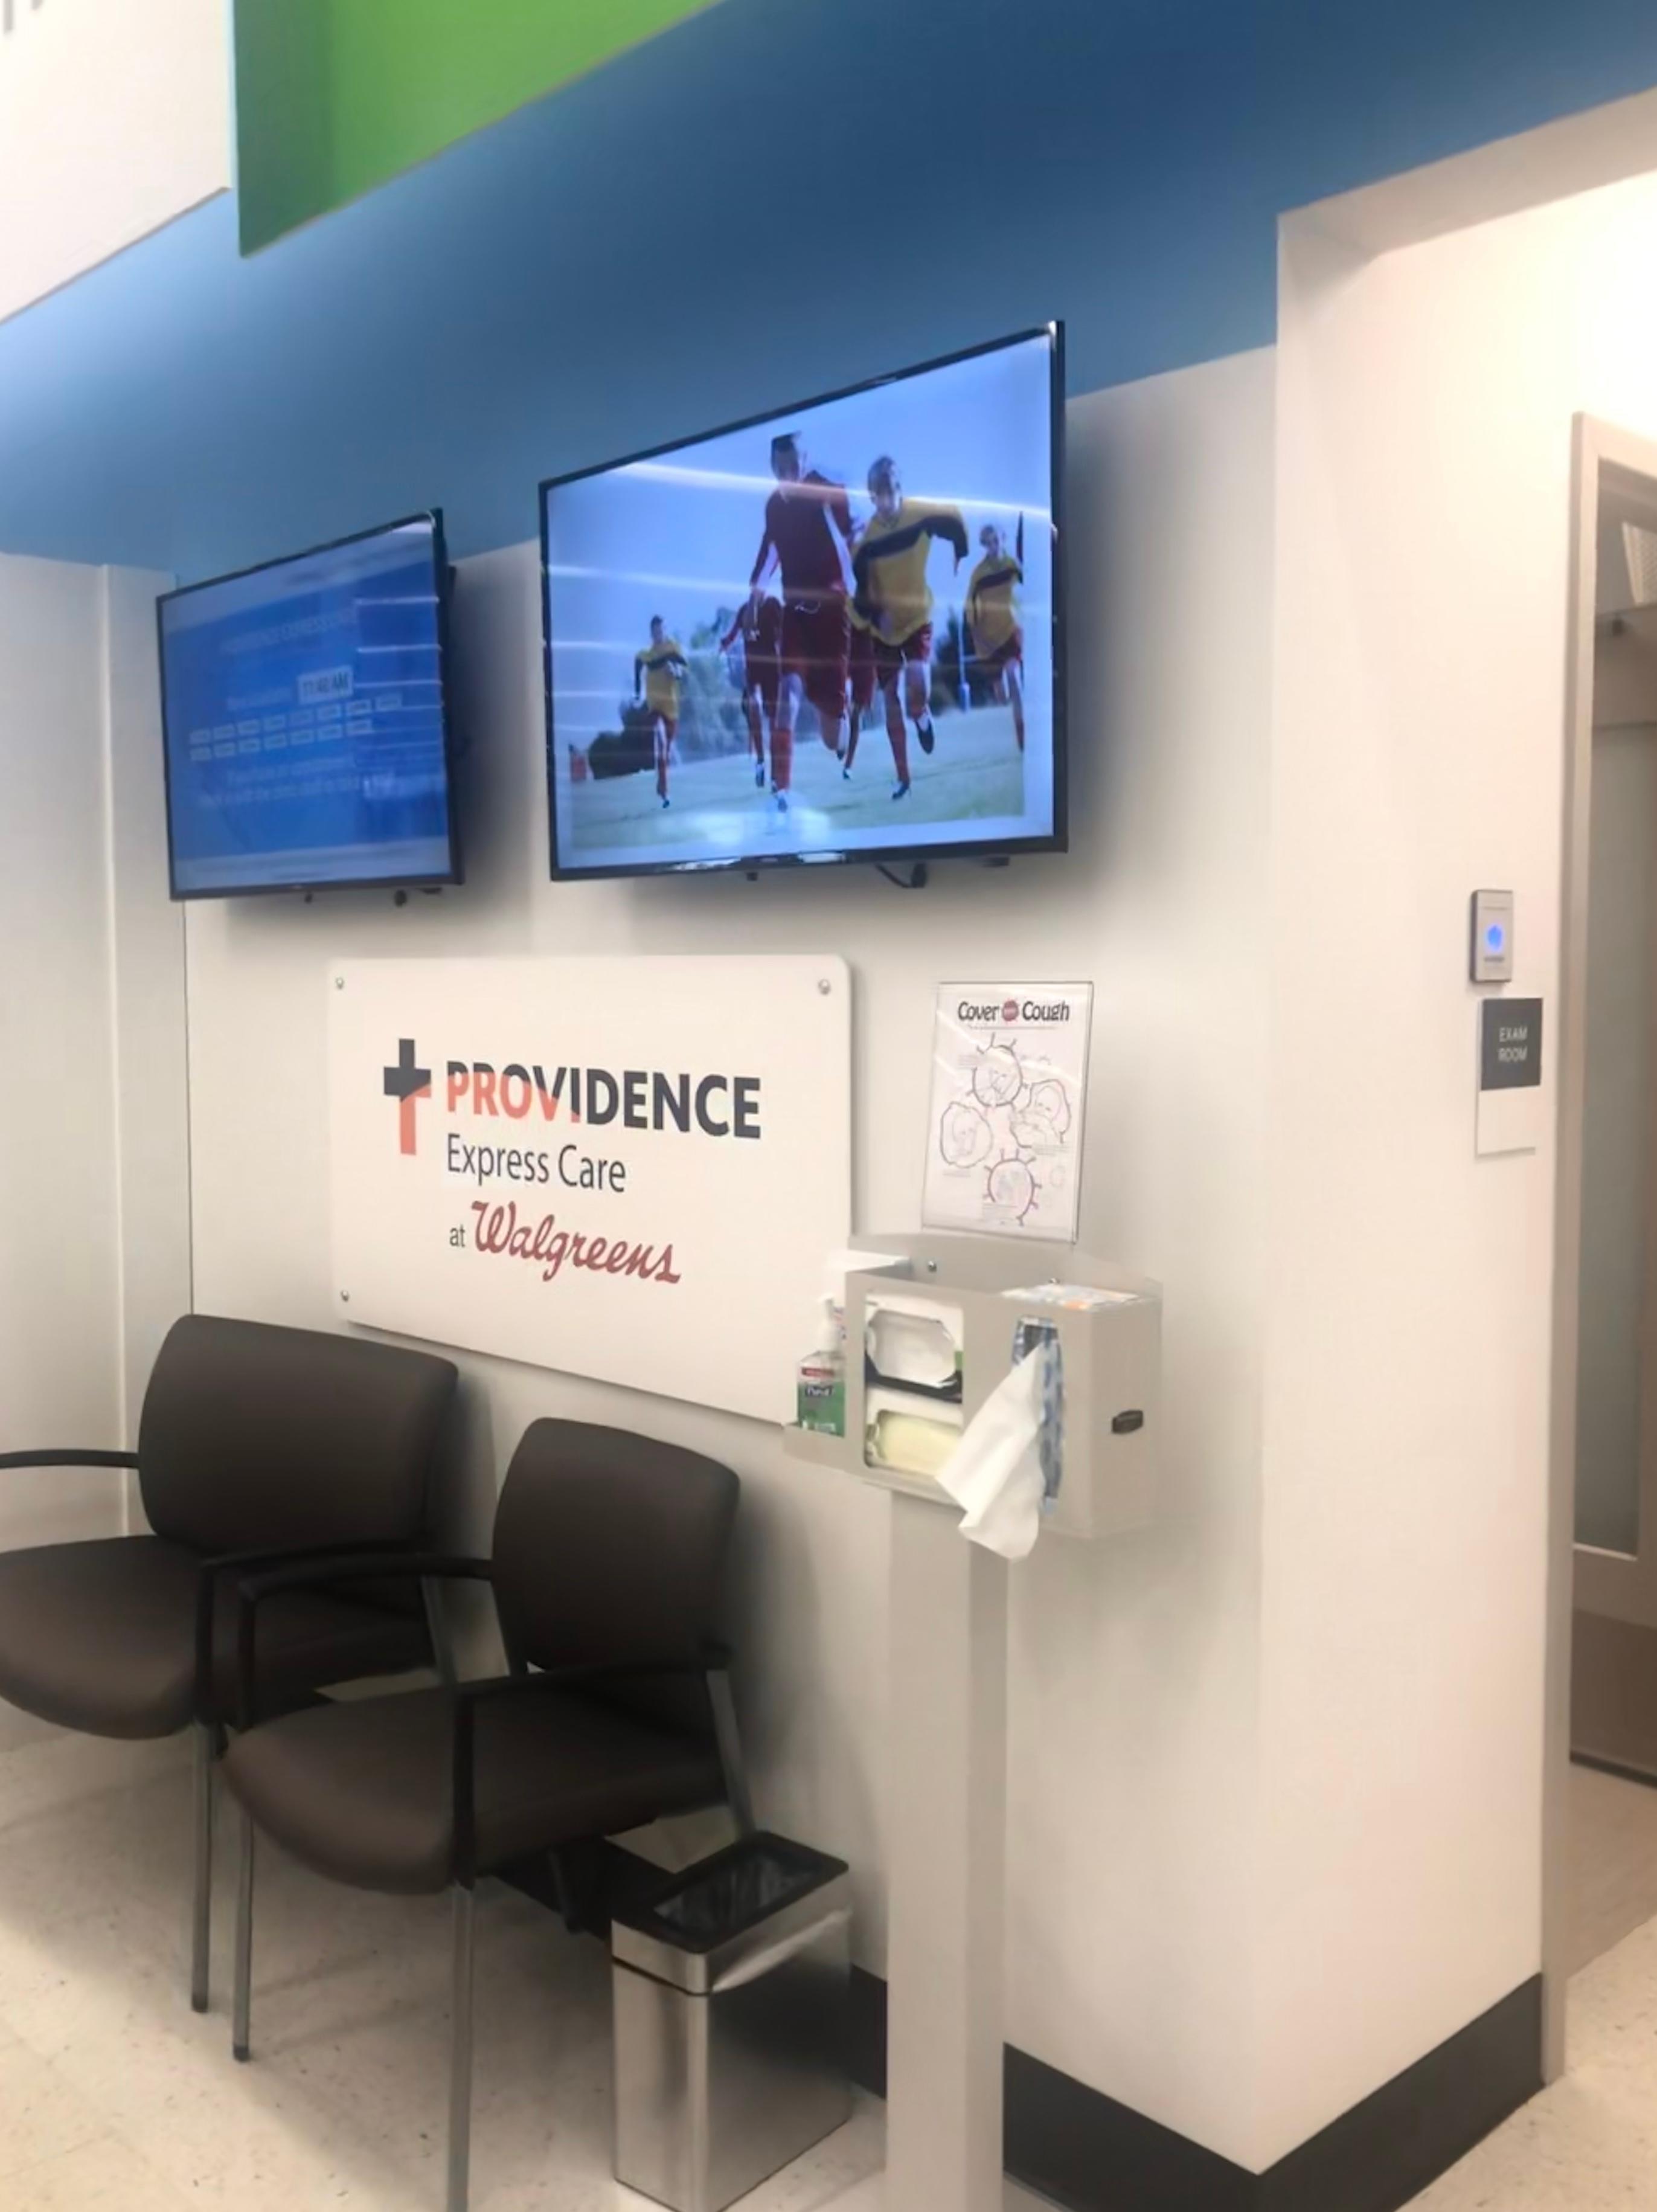 Providence Express Care at Walgreens - Newberg image 2